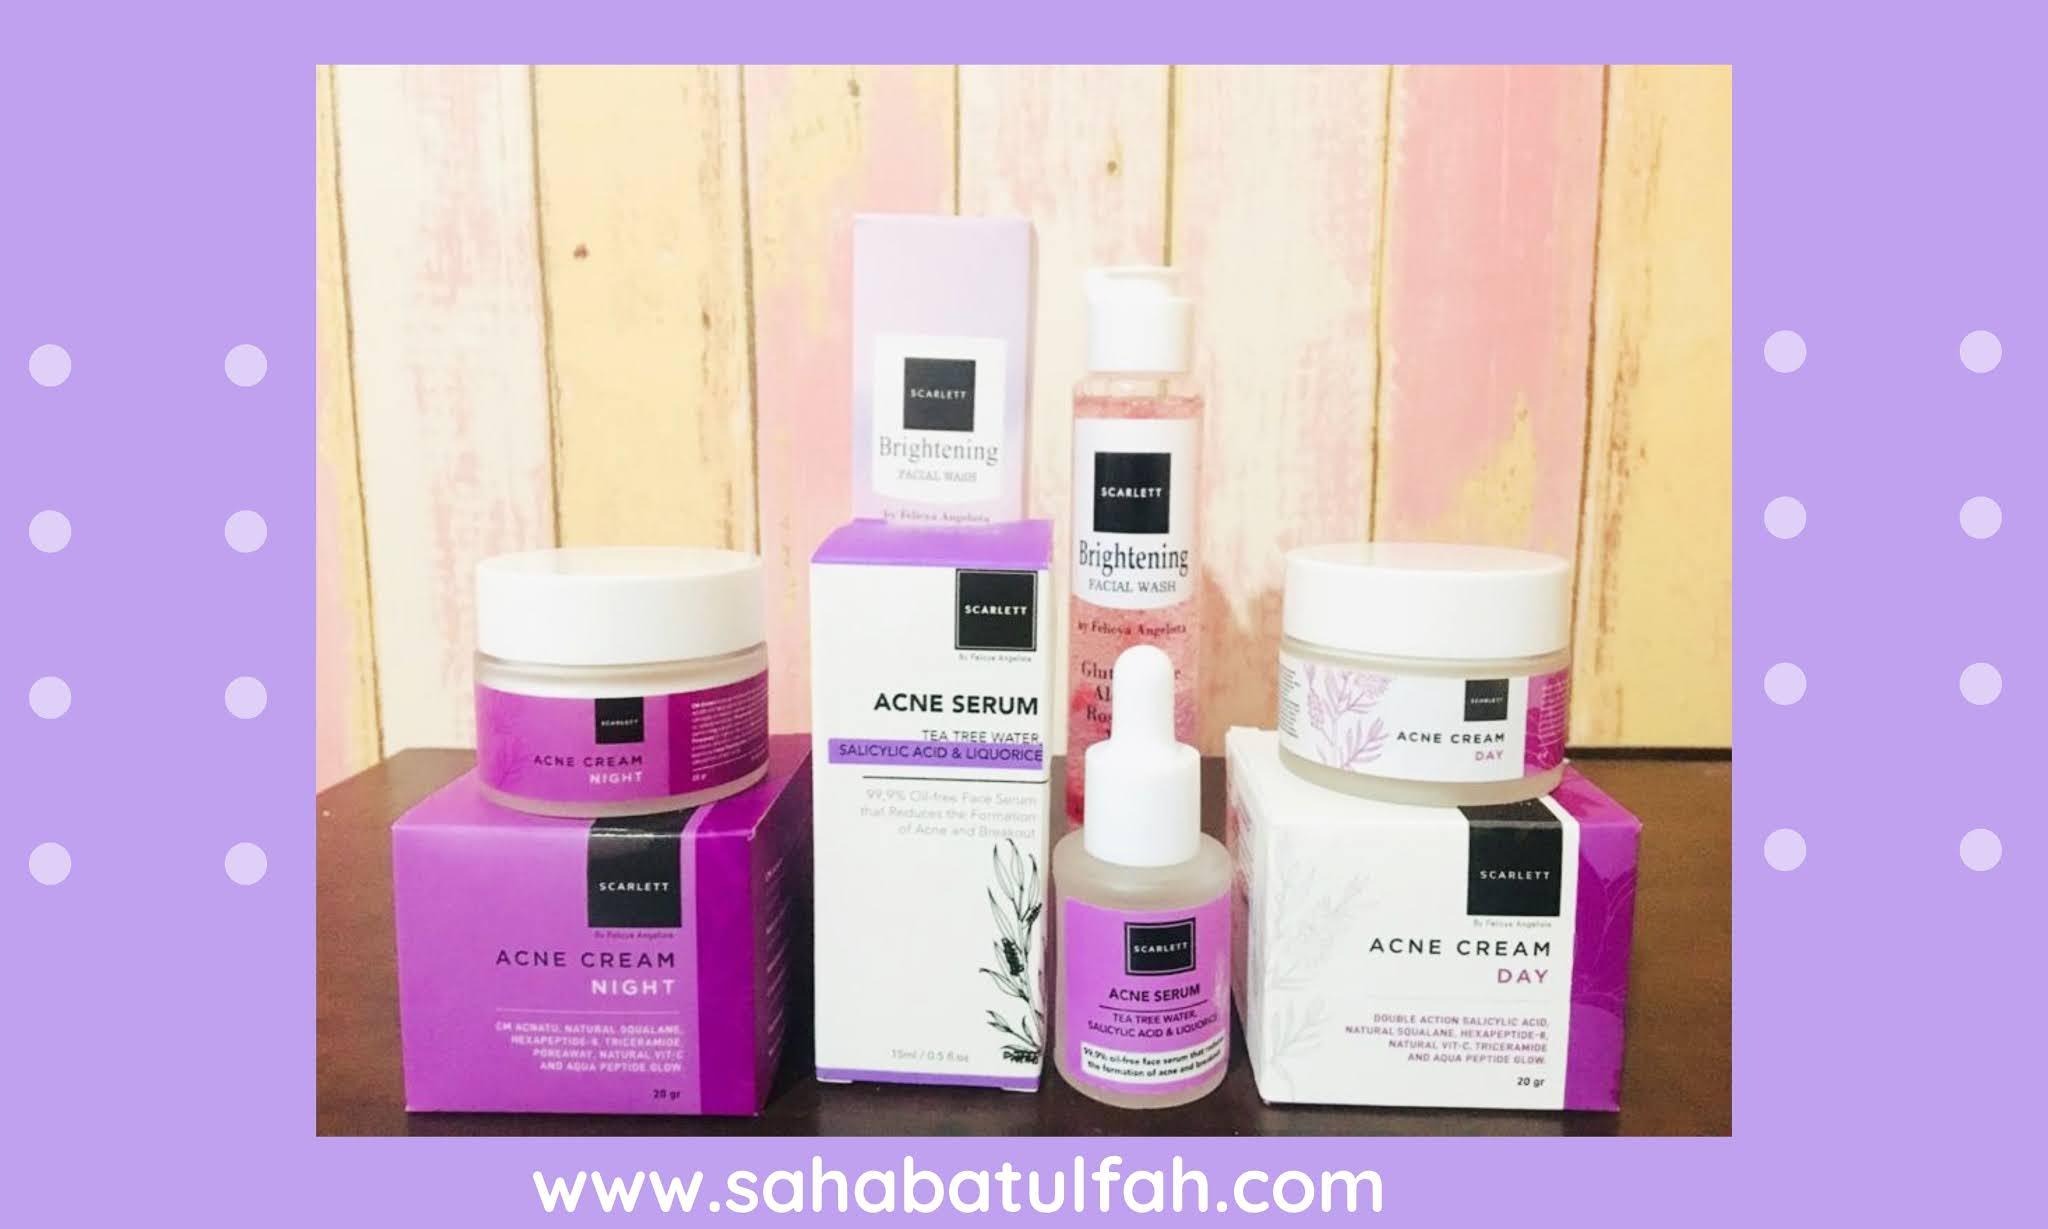 Review-Rangkaian-Varian-Scarlett-Face-Care-Brightening-Facial-Wash-Acne-Serum-Acne-Cream-Day-dan-Acne-Cream-Night